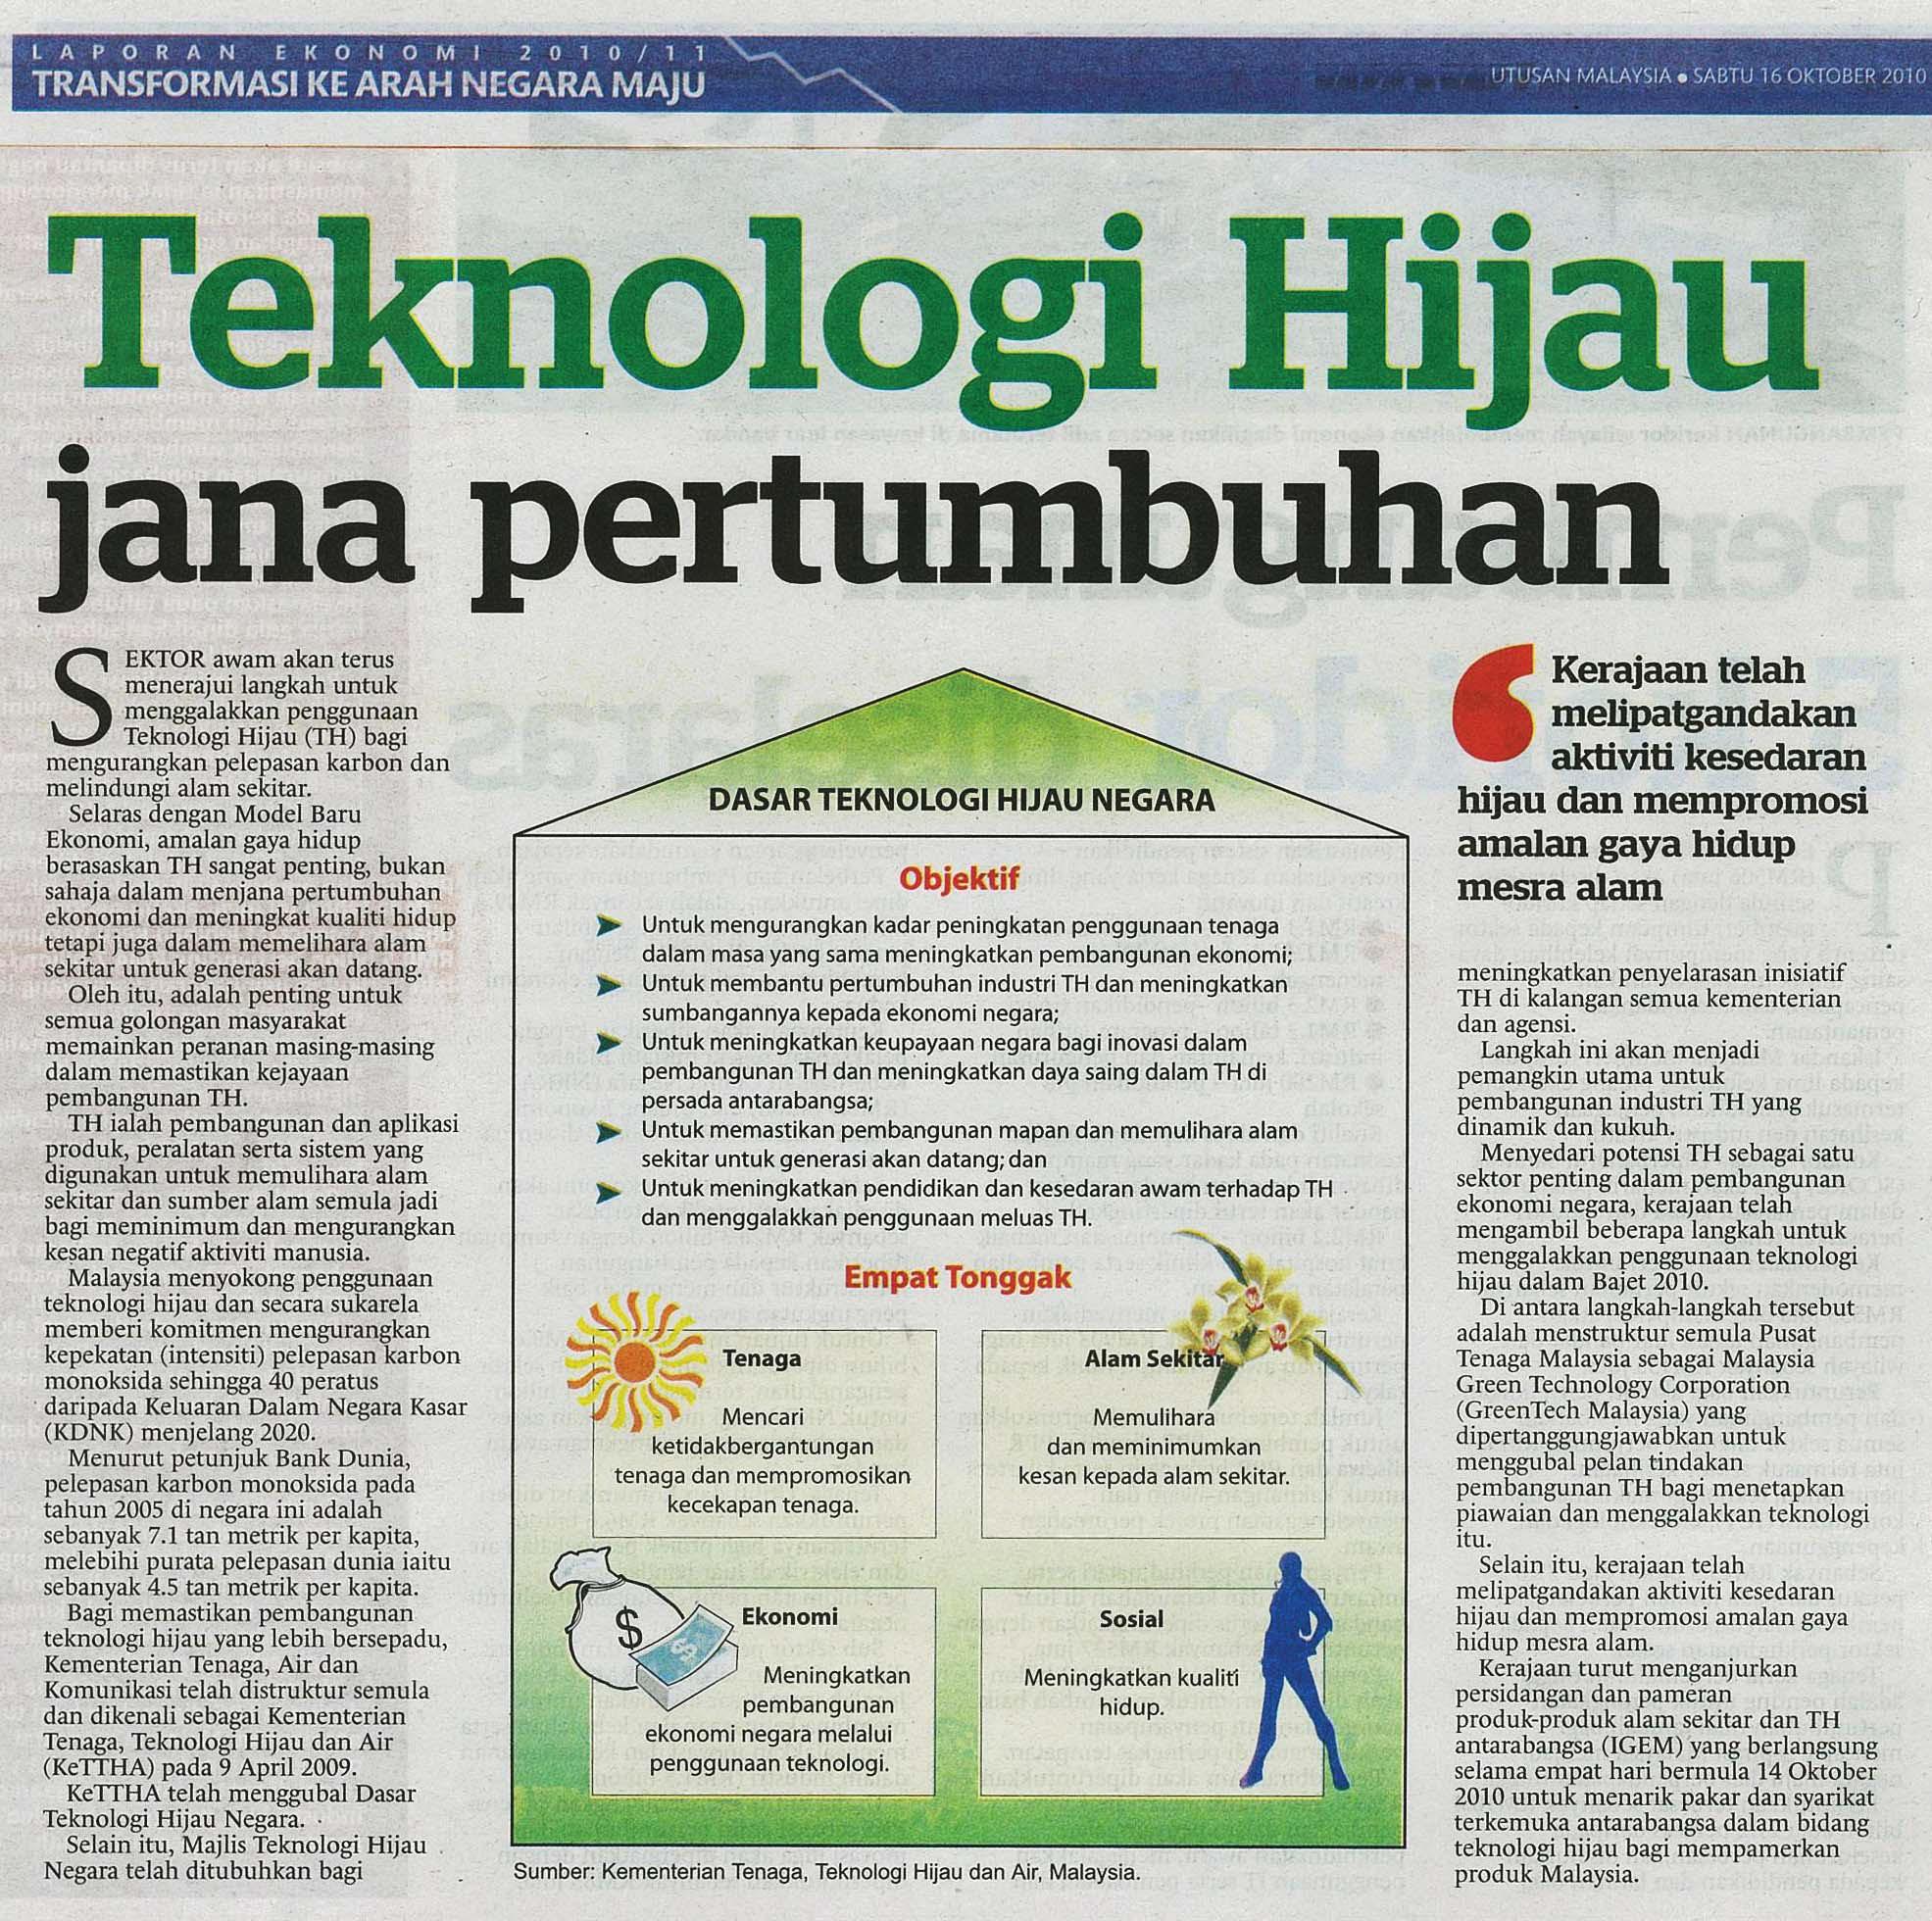 kesan teknologi hijau